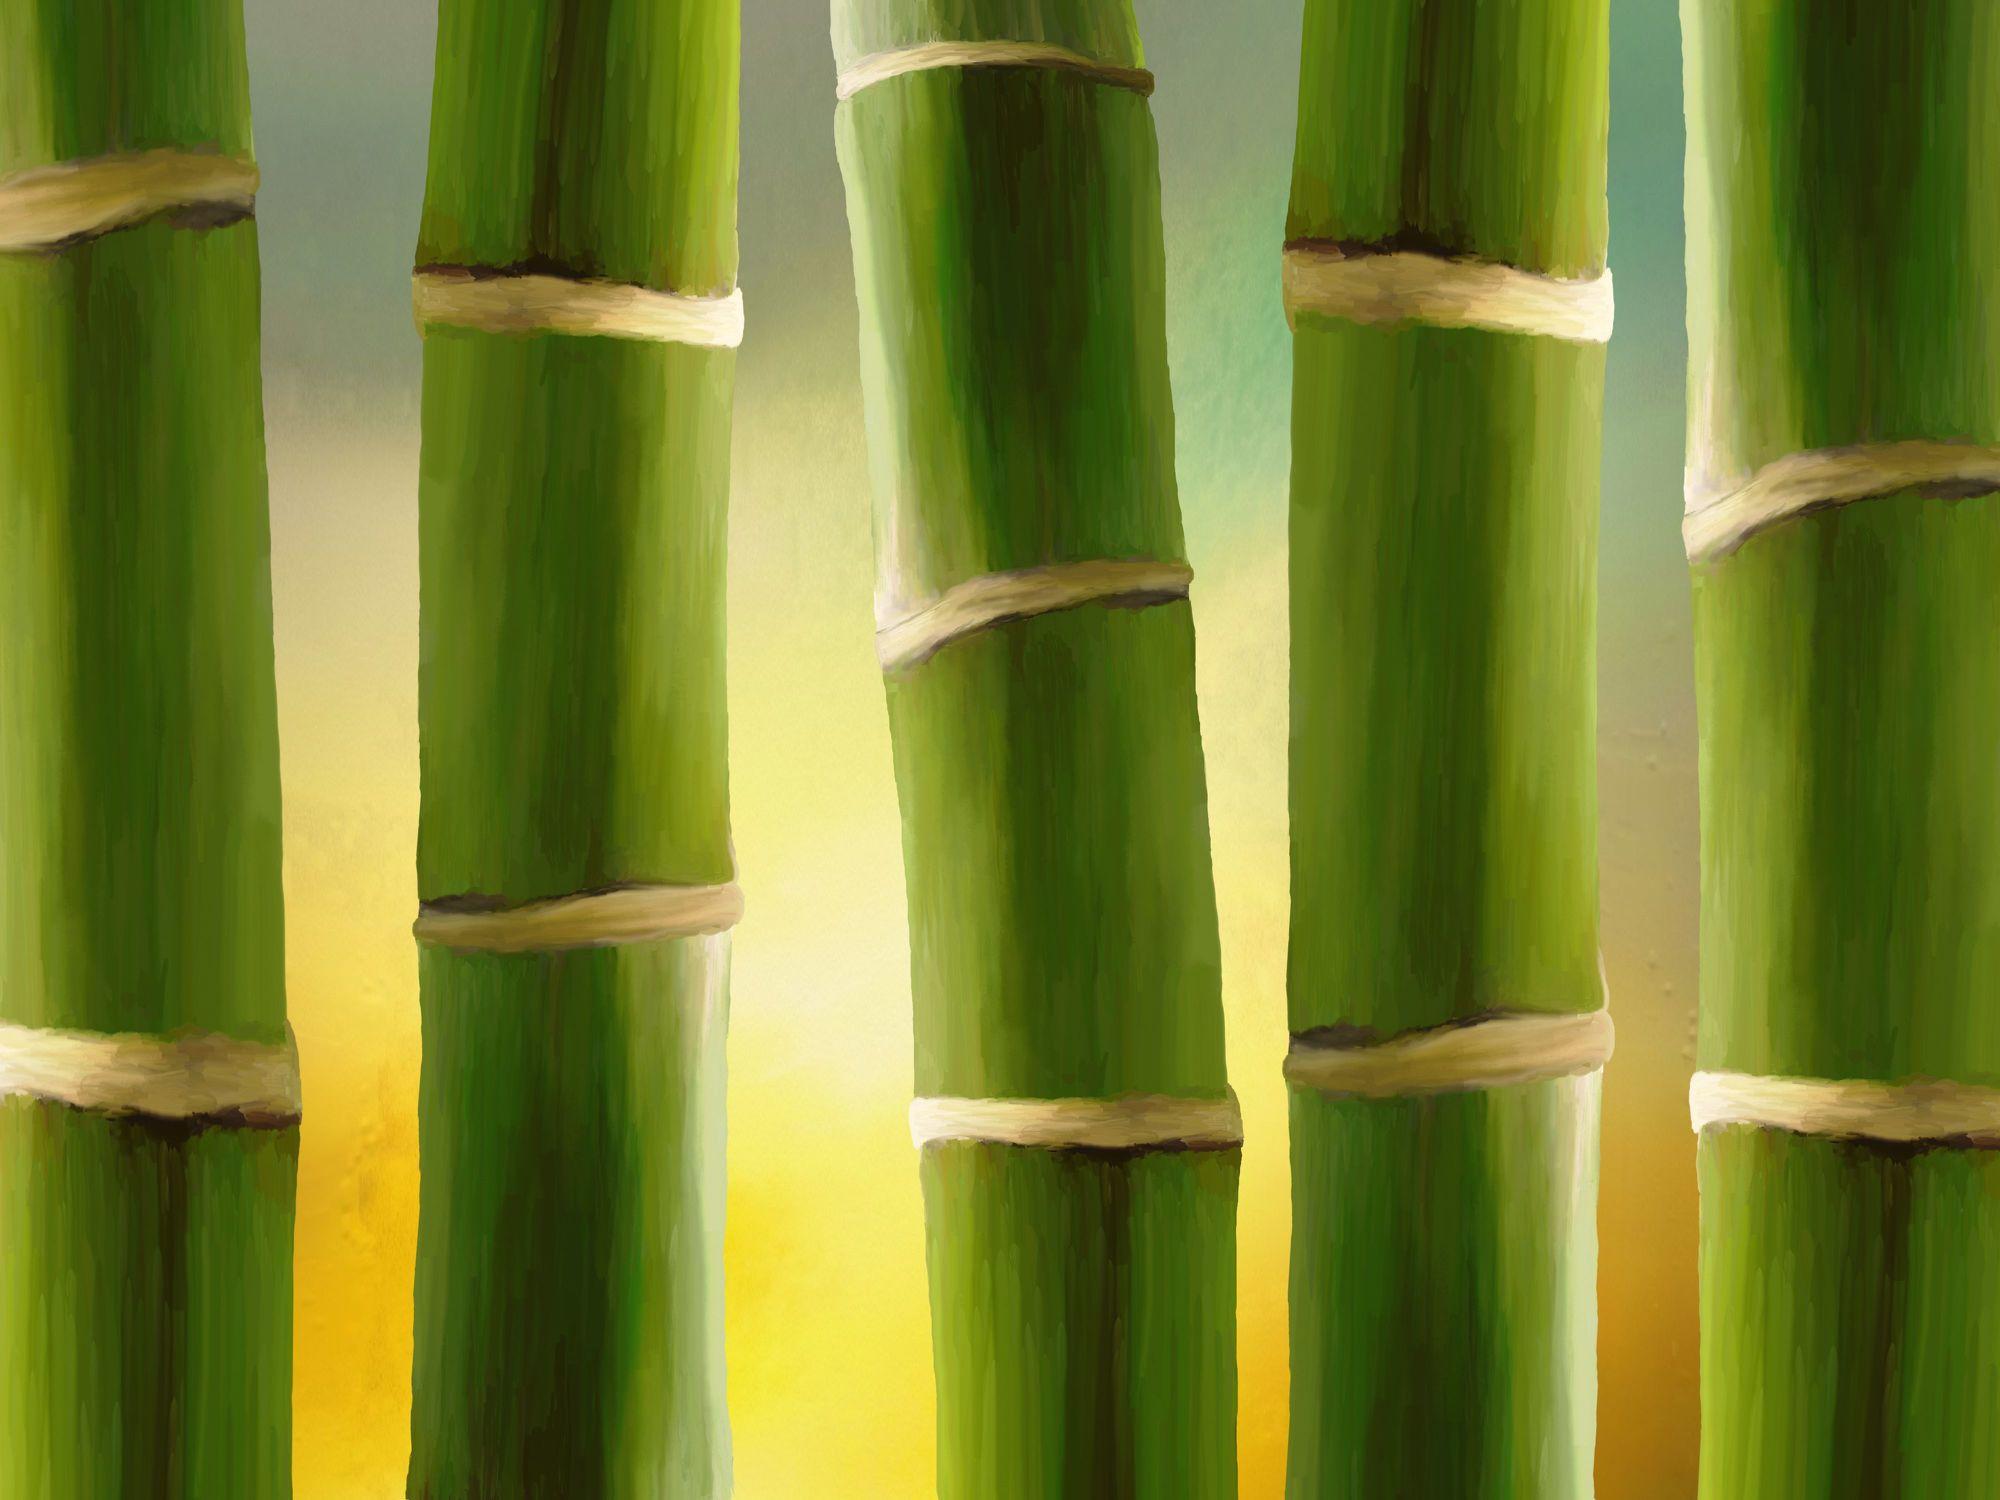 Bild mit Pflanzen, Bambus, Pflanze, Wellness, bambuswald, bambusstangen, bambusrohr, bambuspflanze, Bambusblatt, Bambusblätter